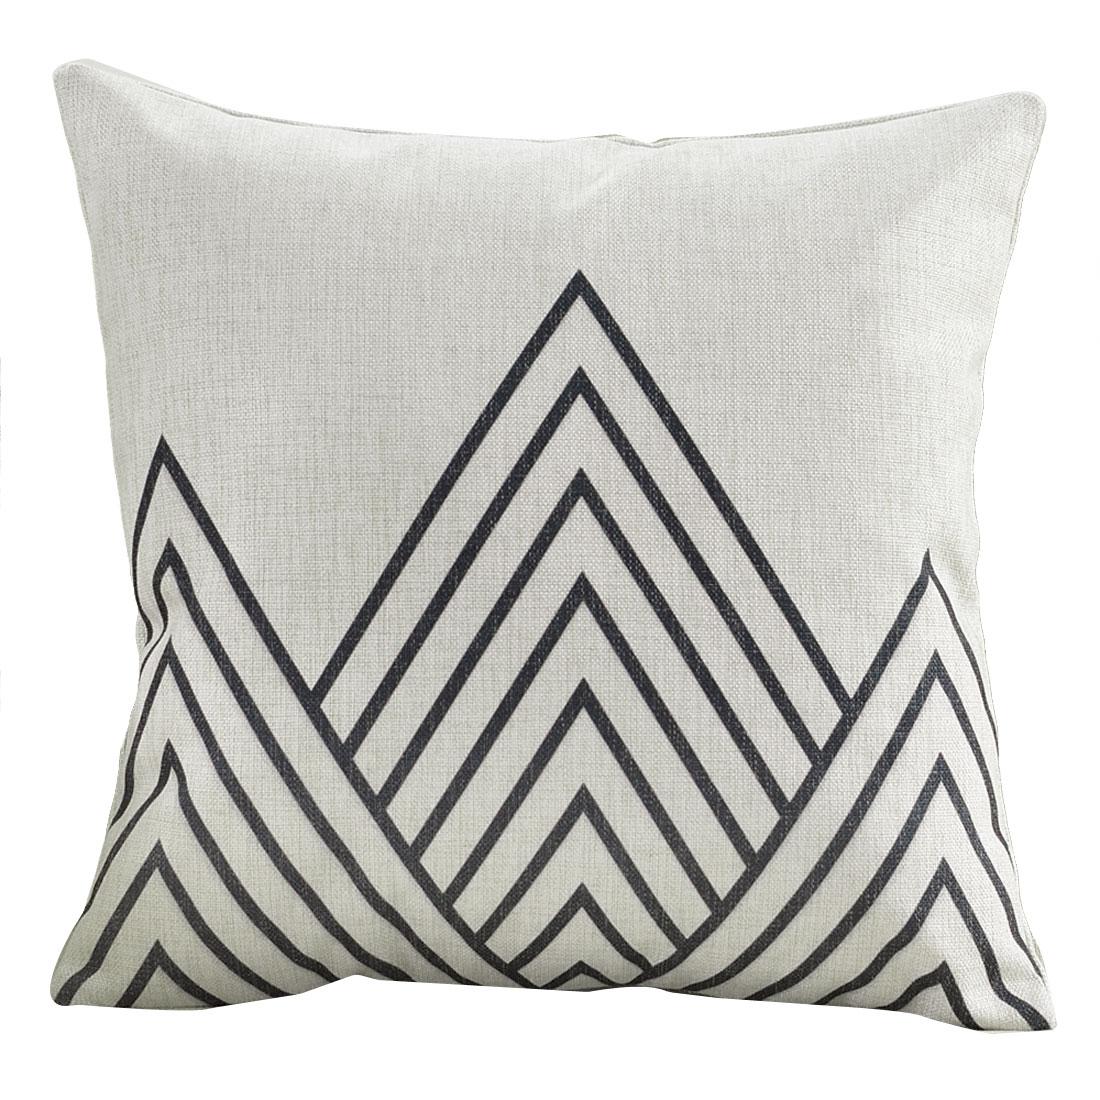 Sofa Cotton Linen Mountain Pattern Square Design Waist Throw Cushion Pillow Cover